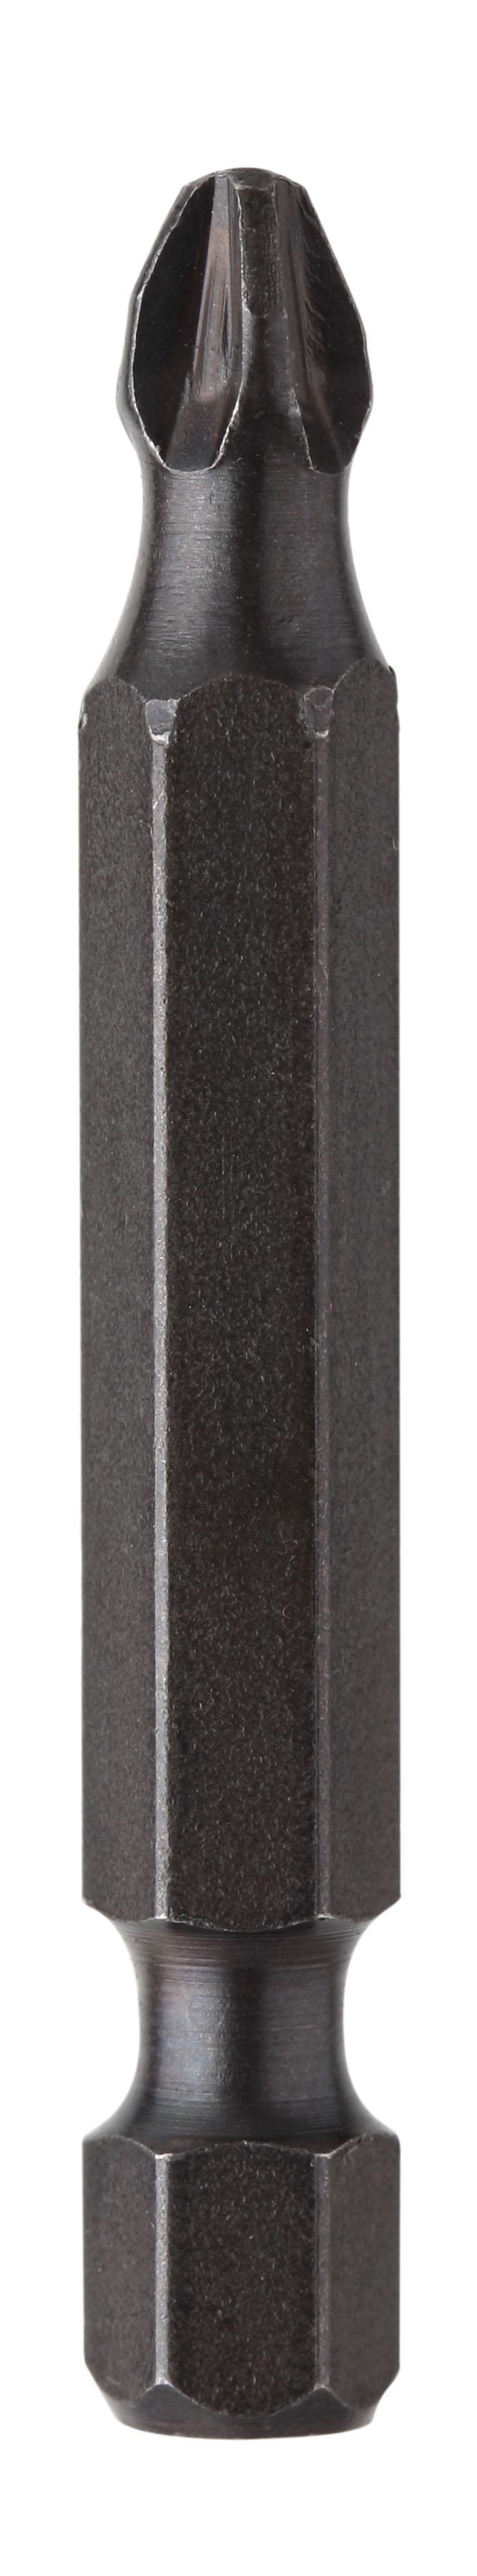 Vissage Embout Torsion Embout torsion Pozidriv - L25 & 50 mm - U642PZ2L050.jpg